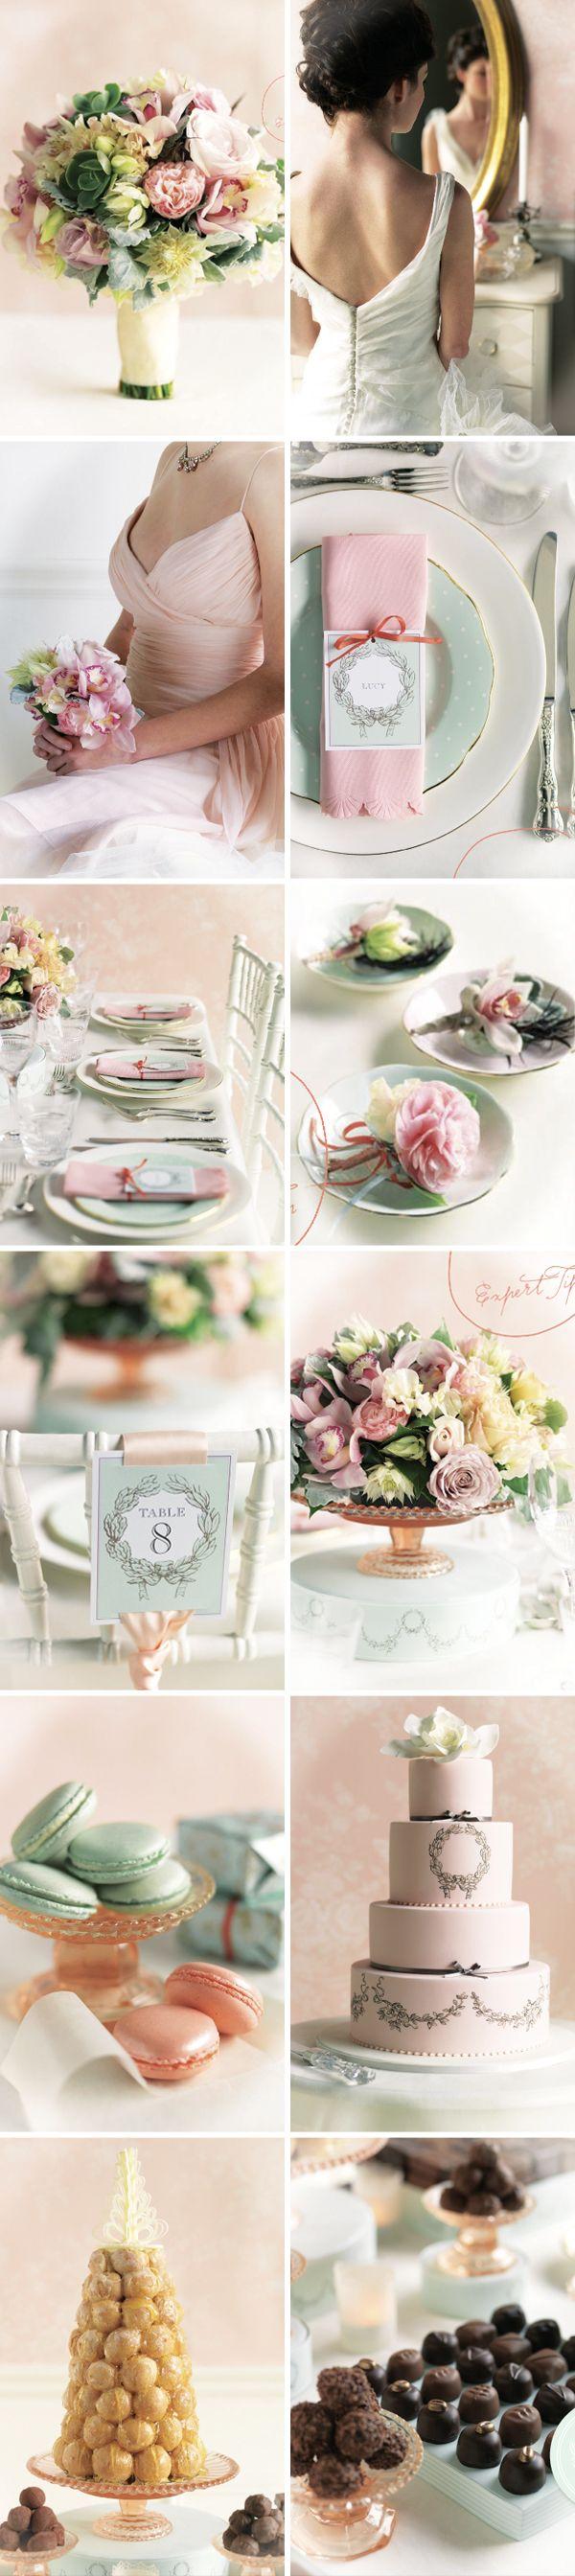 Wedding Themes » NYC Wedding Photography Blog